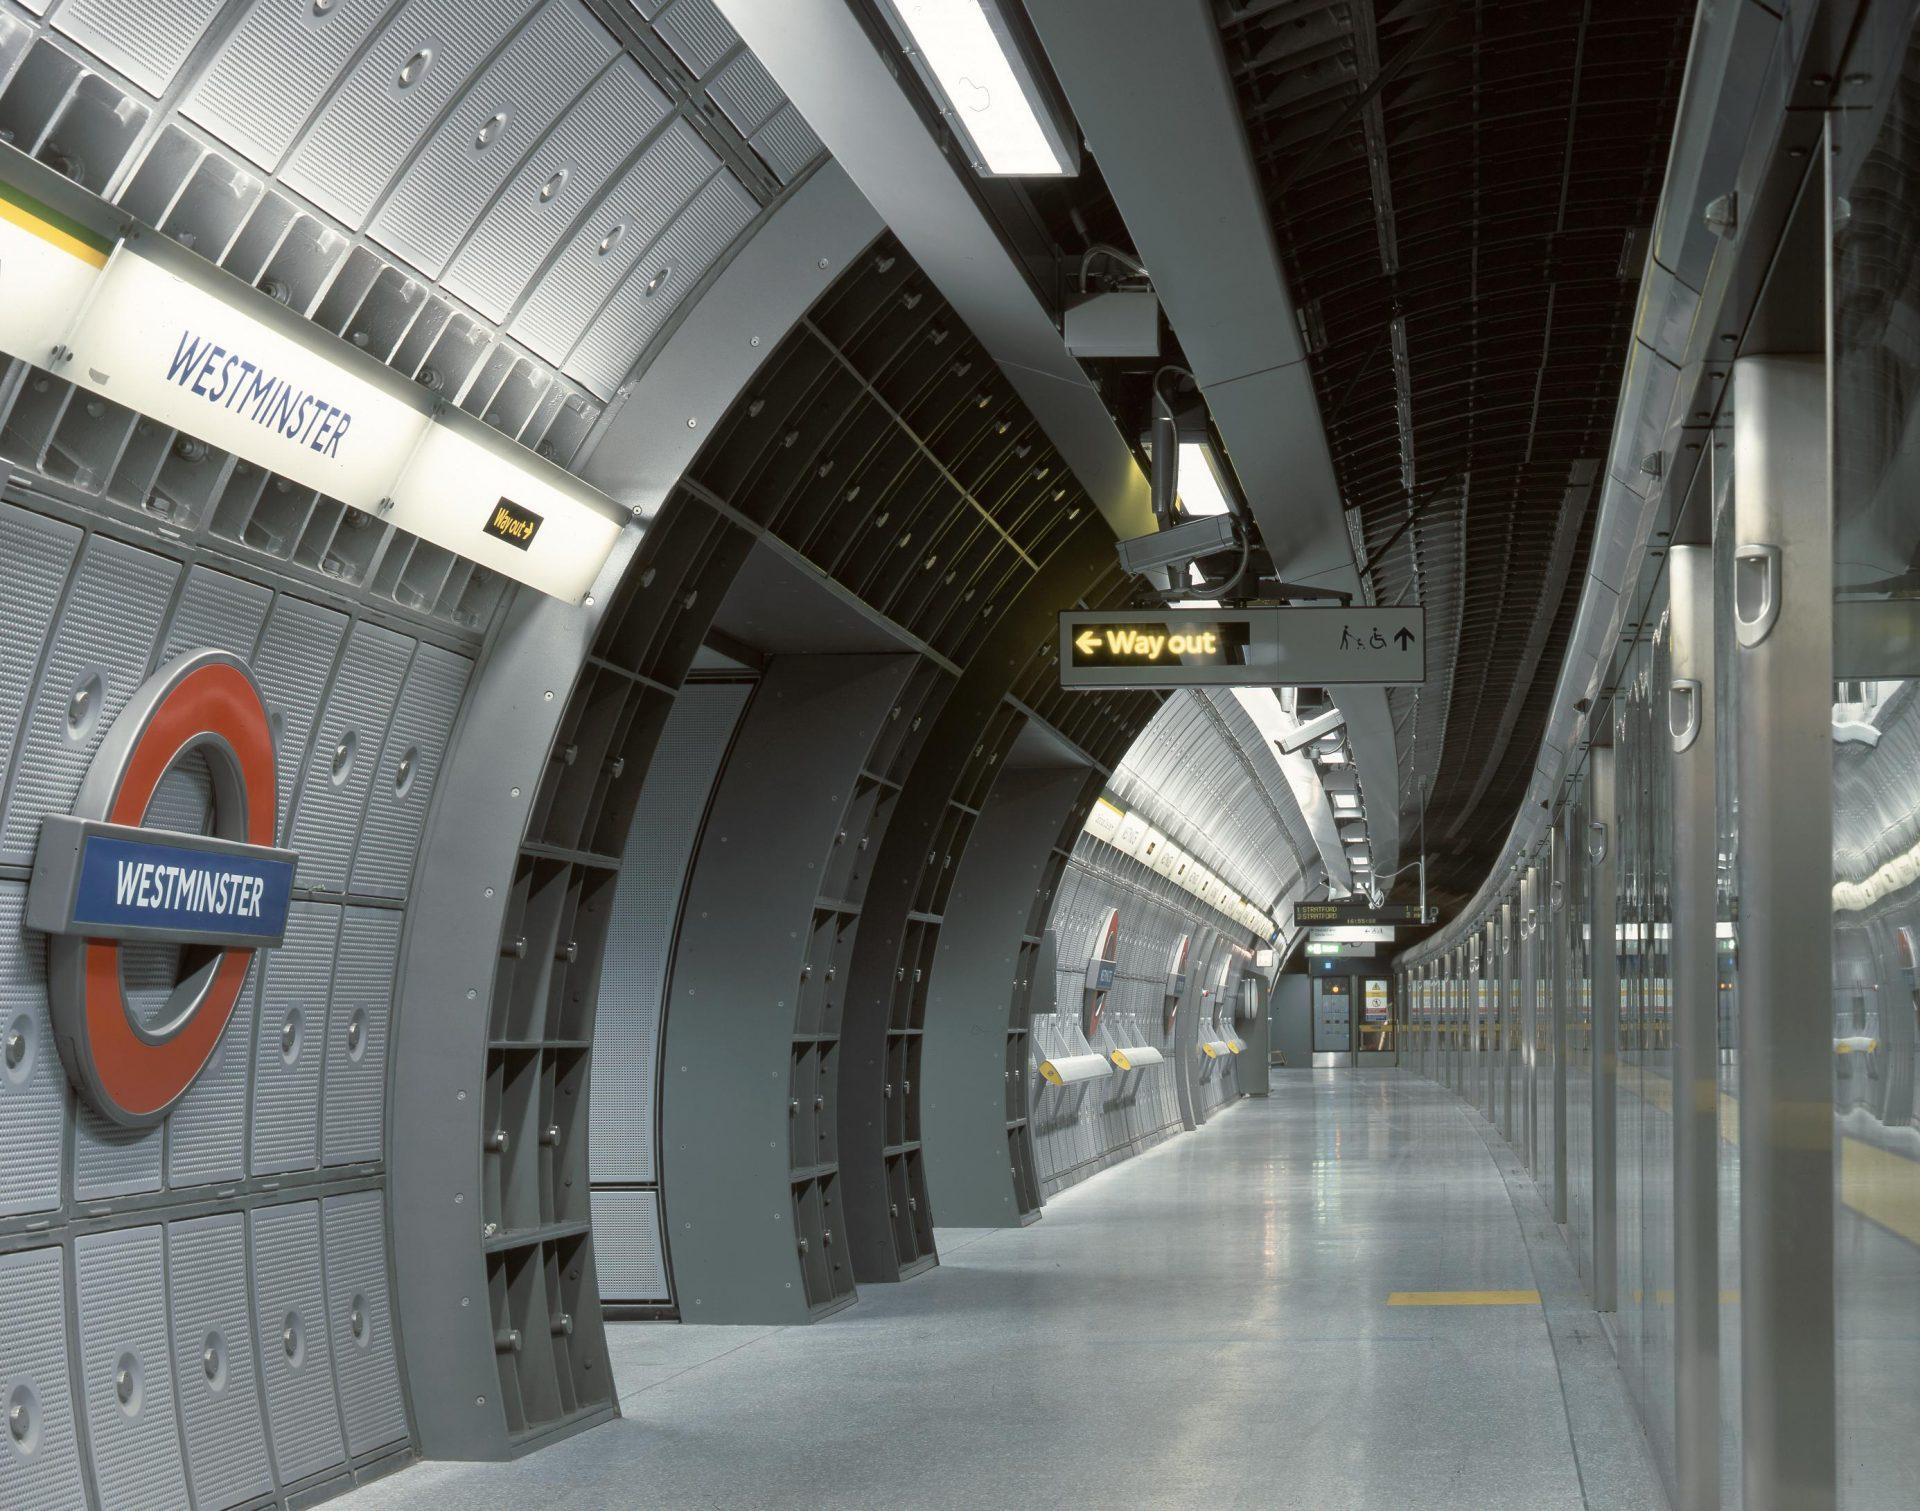 Westminster Tube Station, Jubilee Line